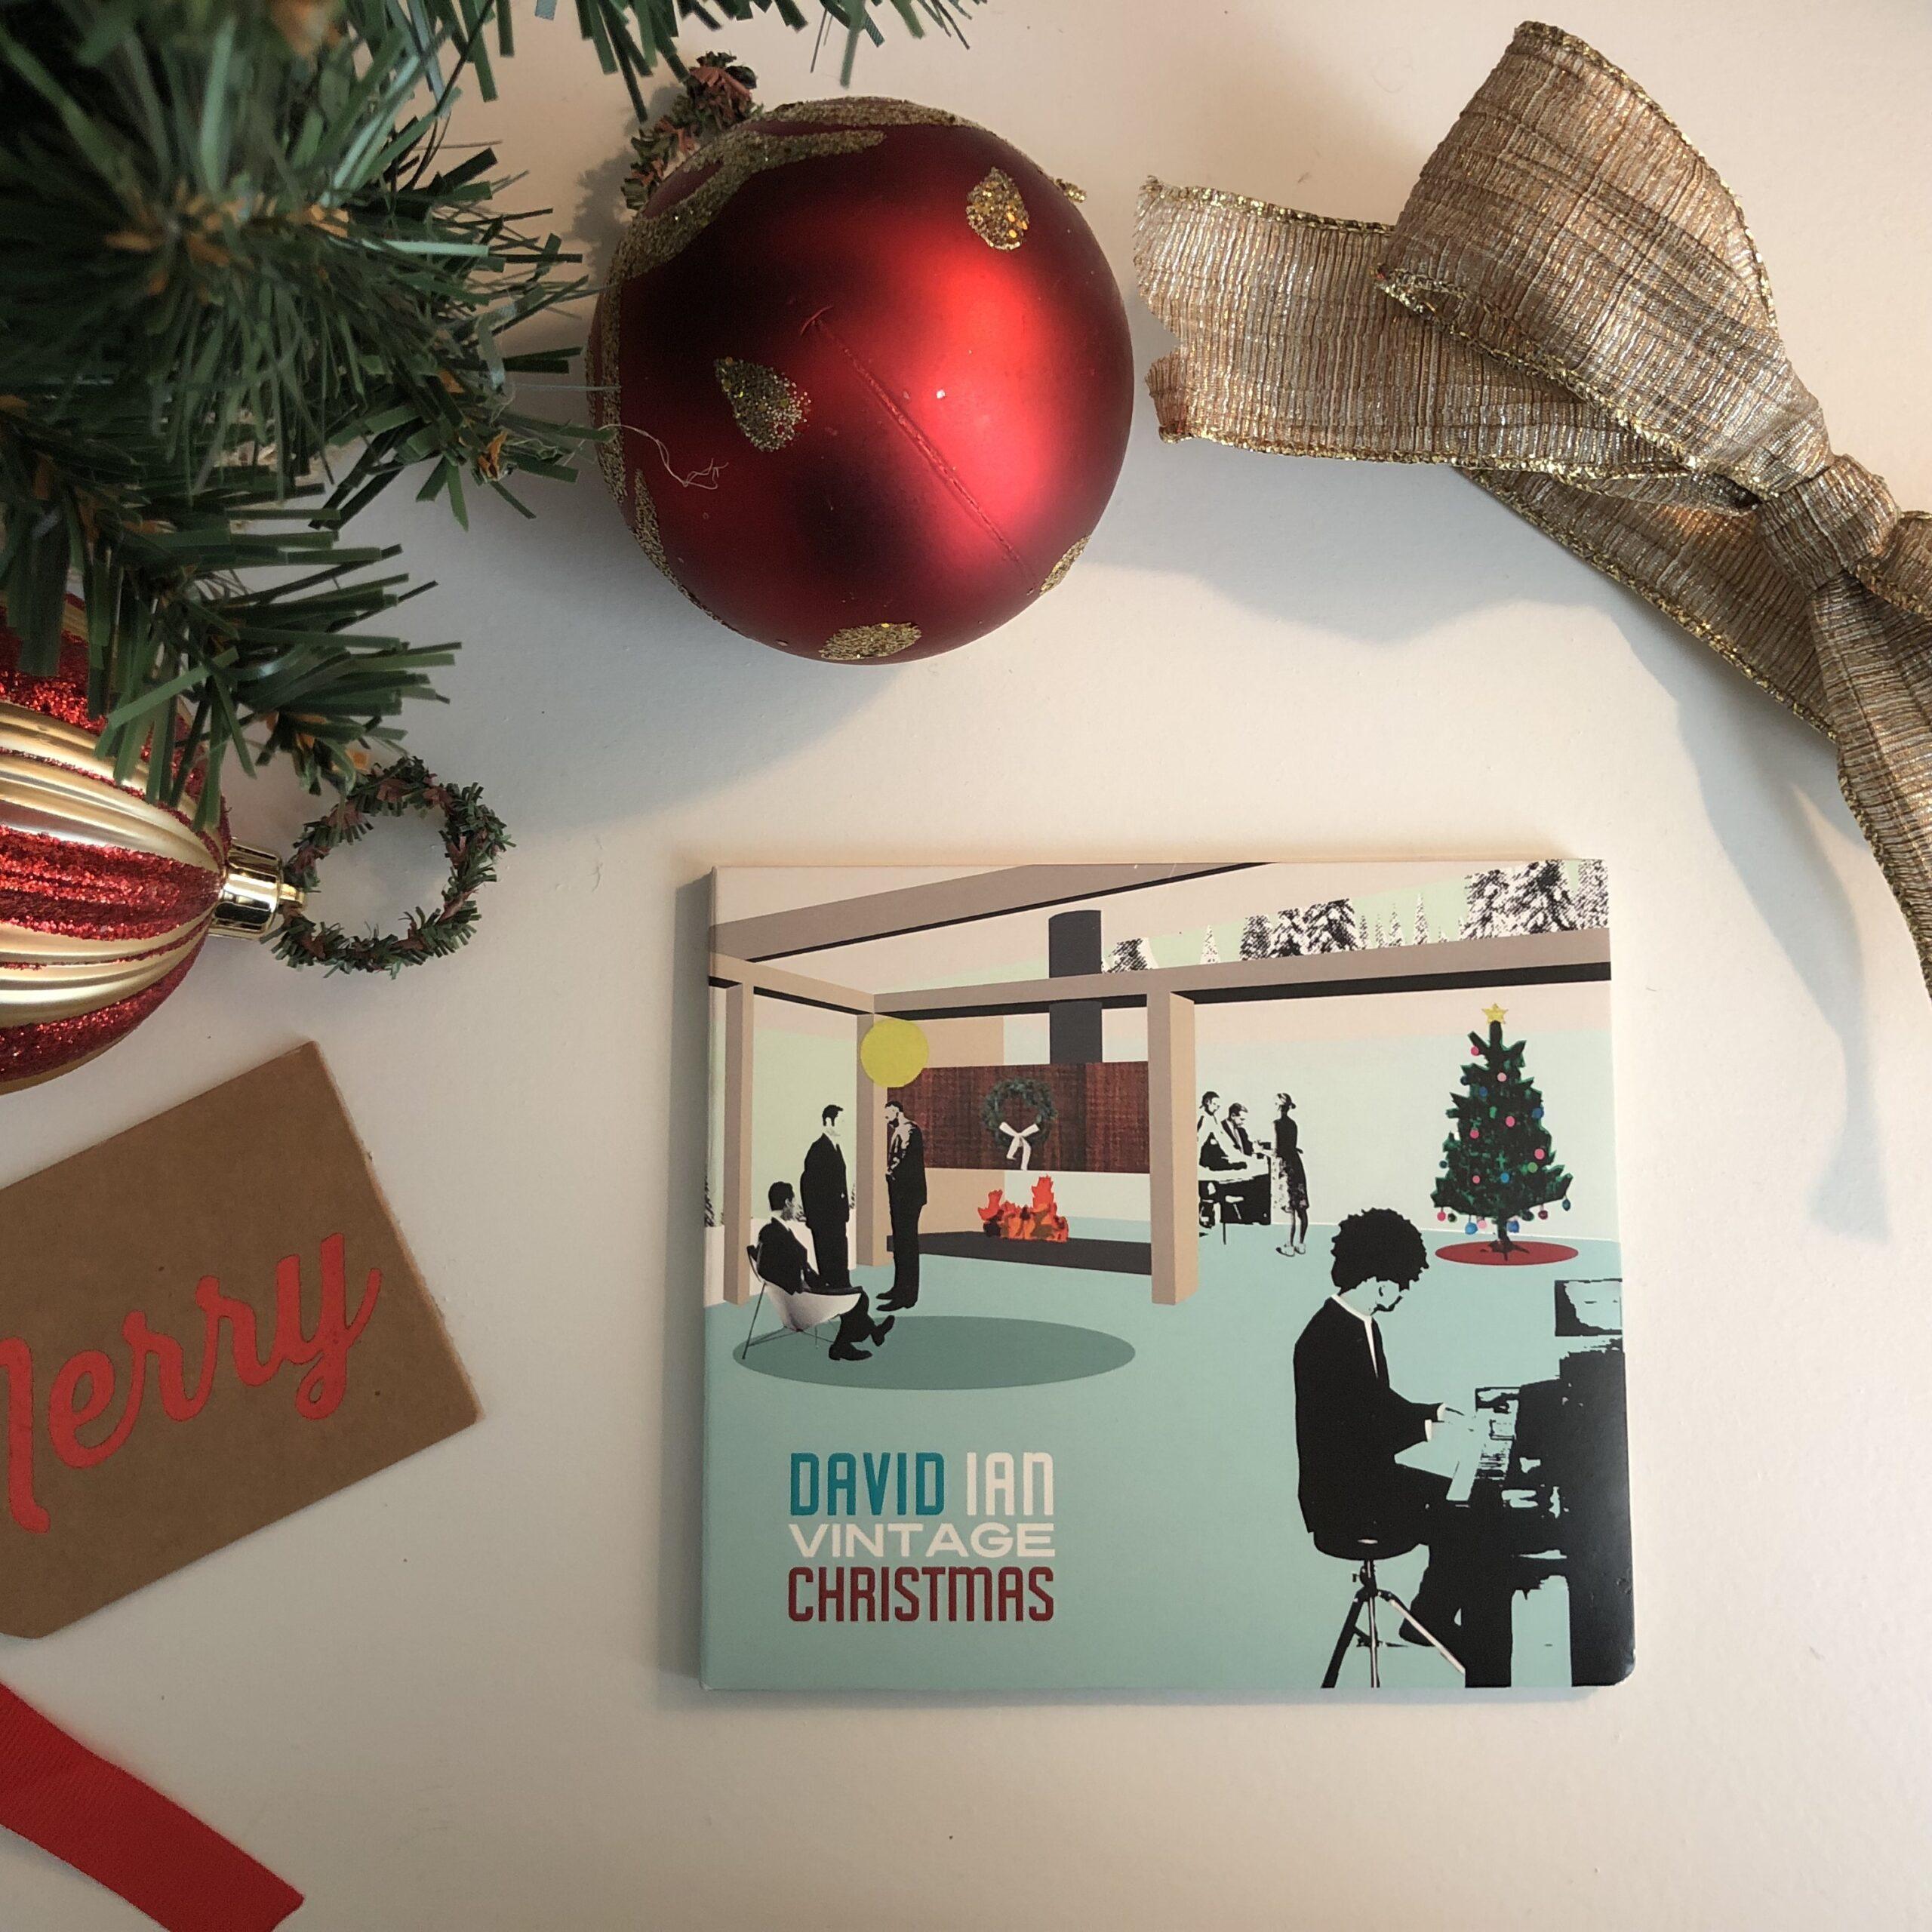 David Ian Christmas Album Set